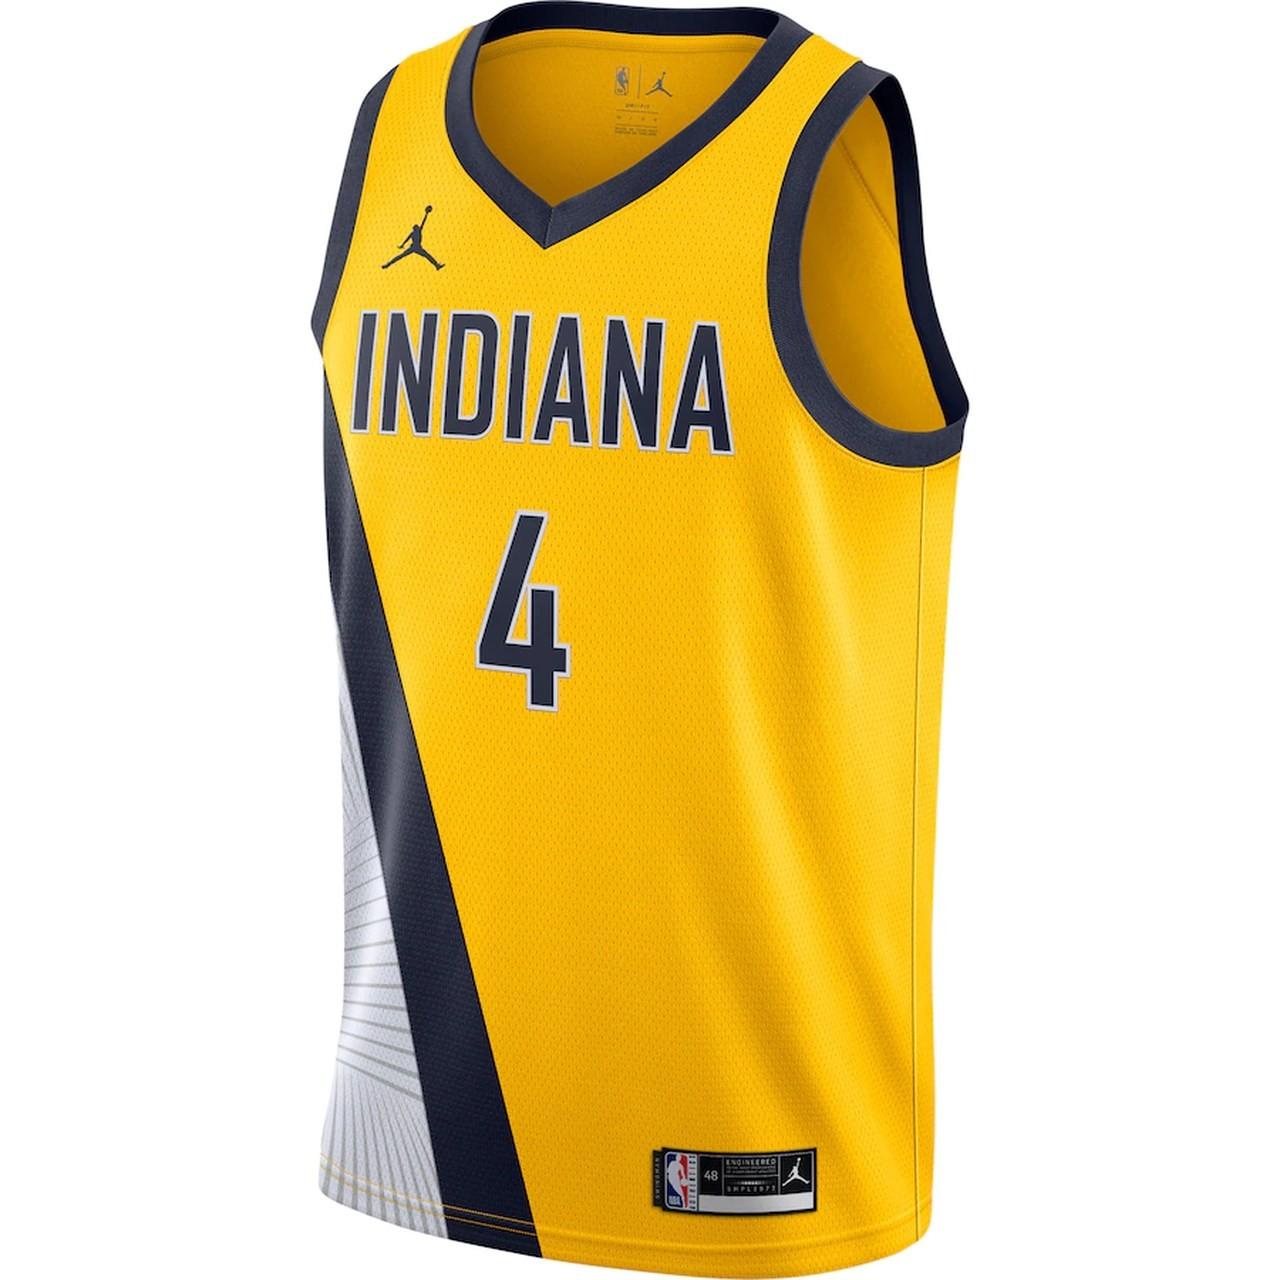 Regata Nike Indiana Pacers Statement Edition 2020/21 Swingman